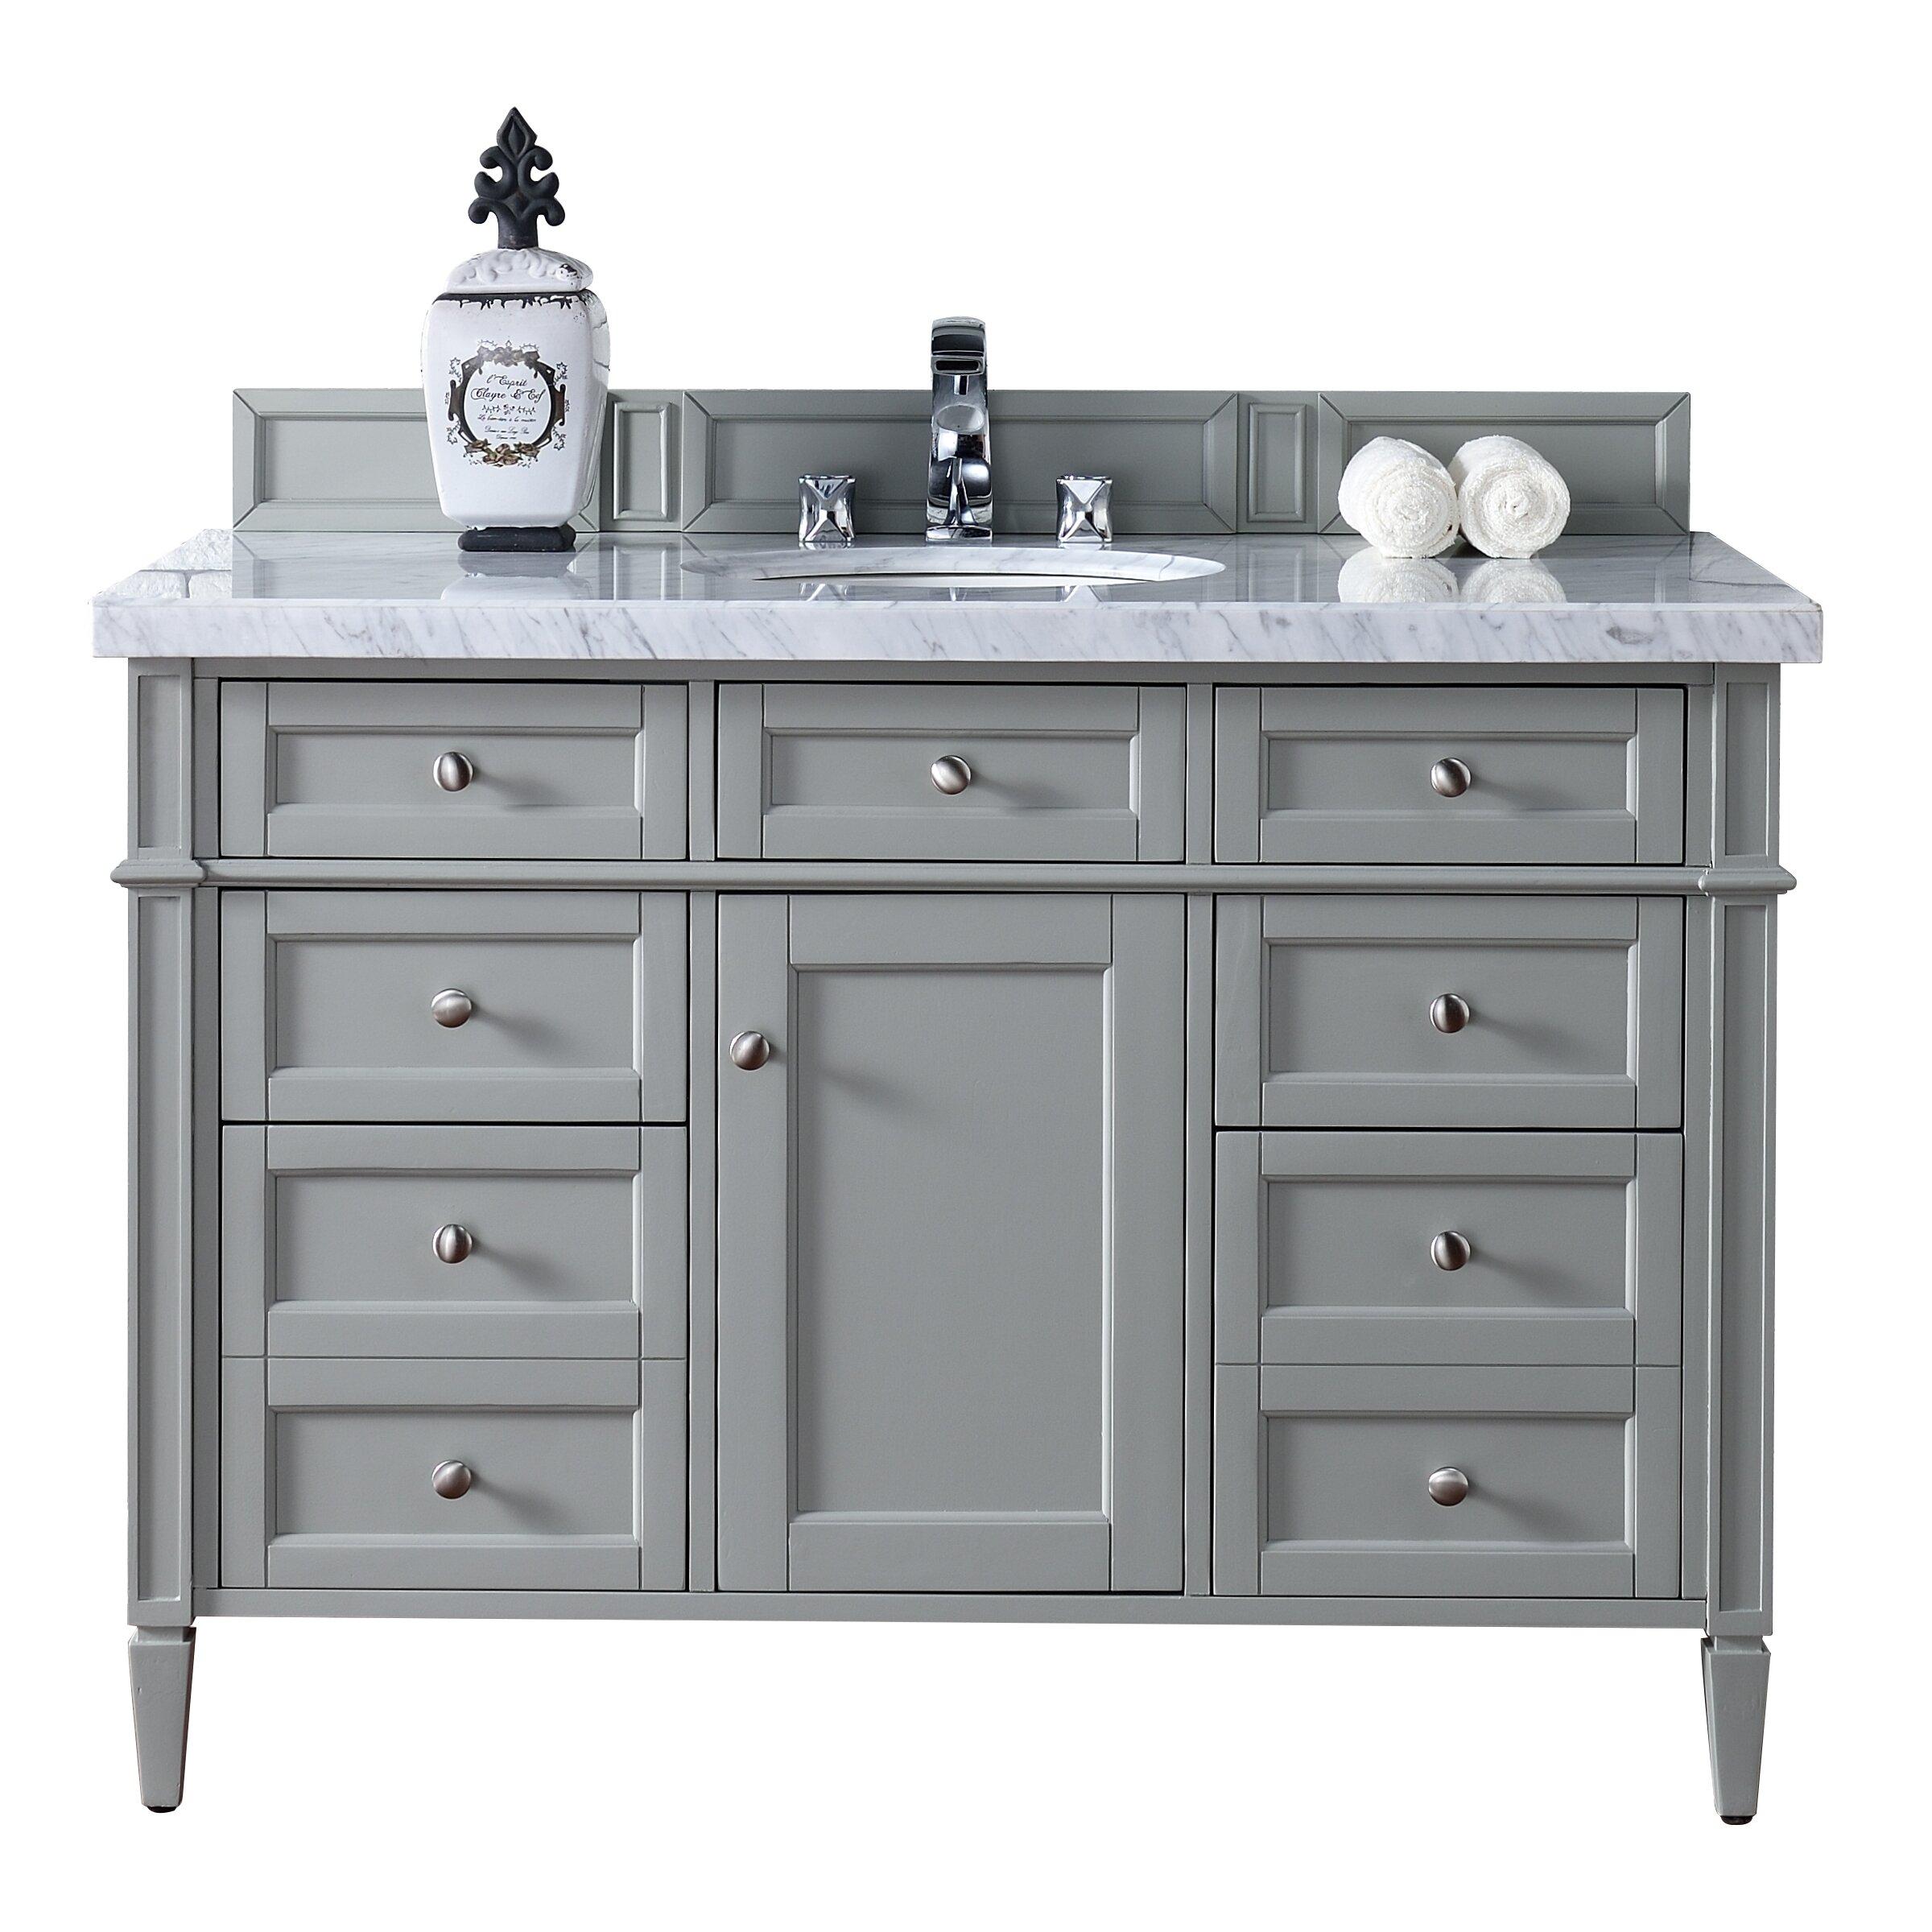 Bathroom Vanity Base James Martin Furniture Brittany 48 Single Bathroom Vanity Base